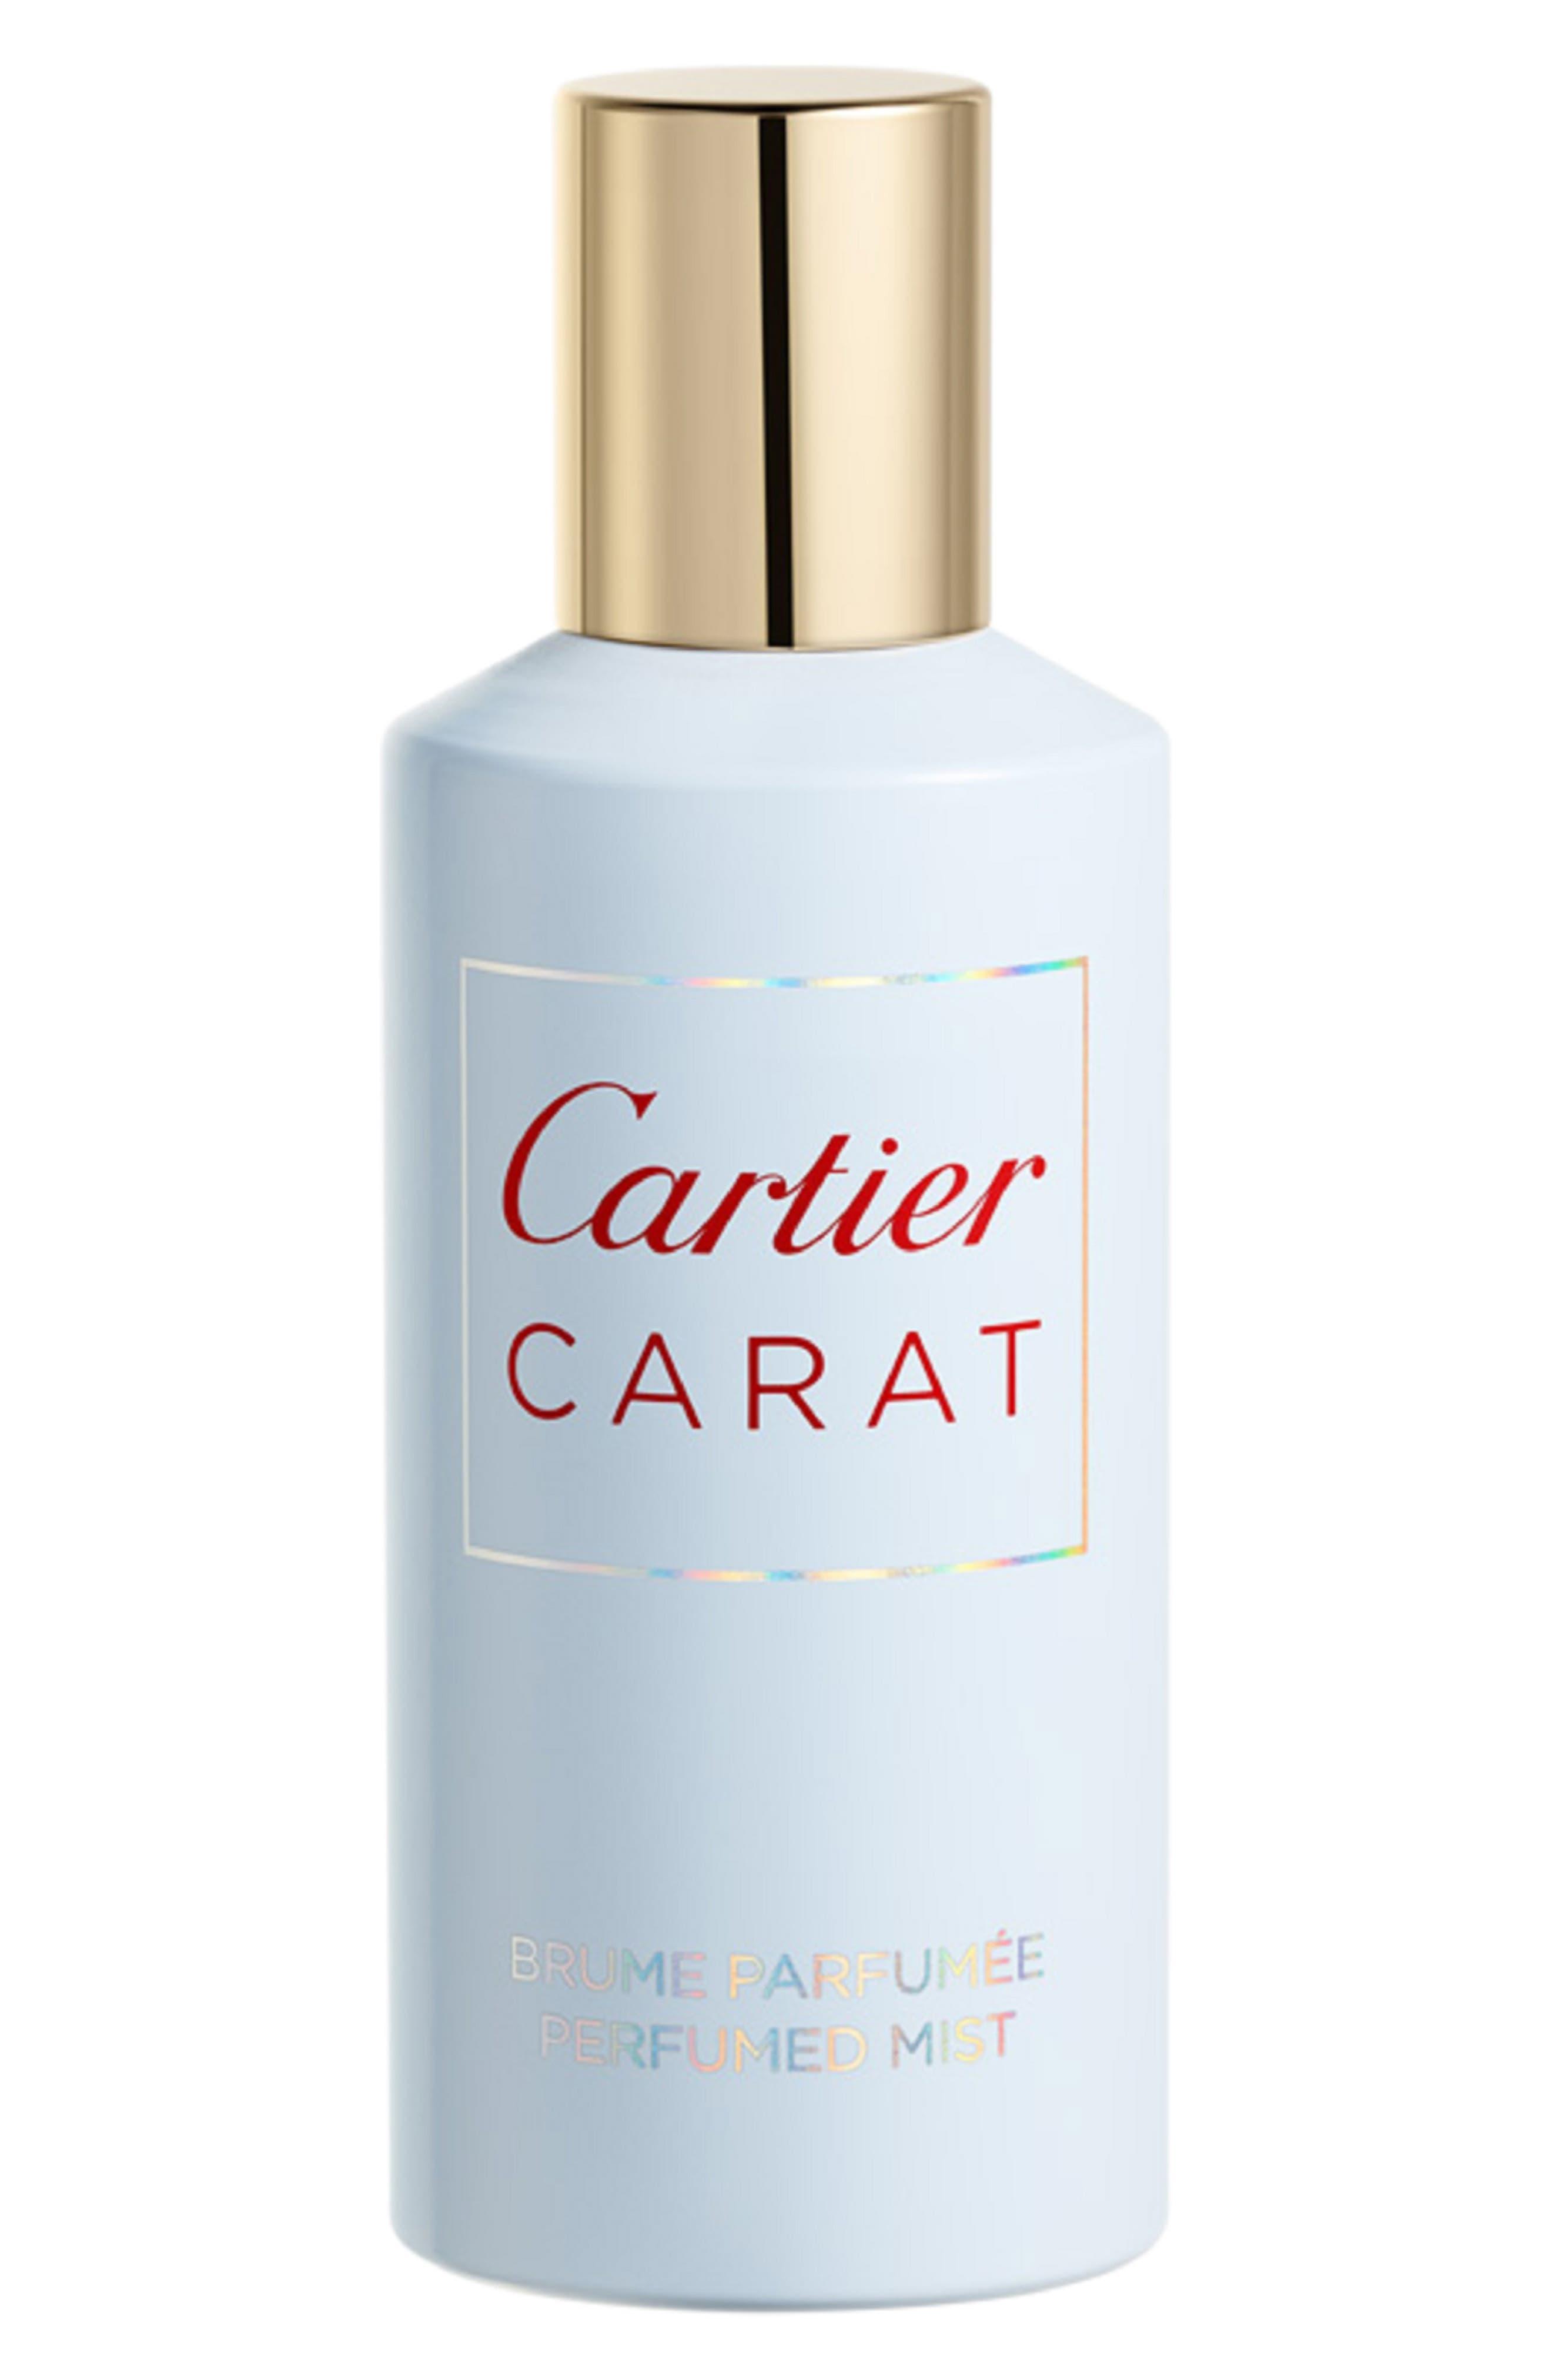 Cartier Carat Perfumed Hair And Body Mist